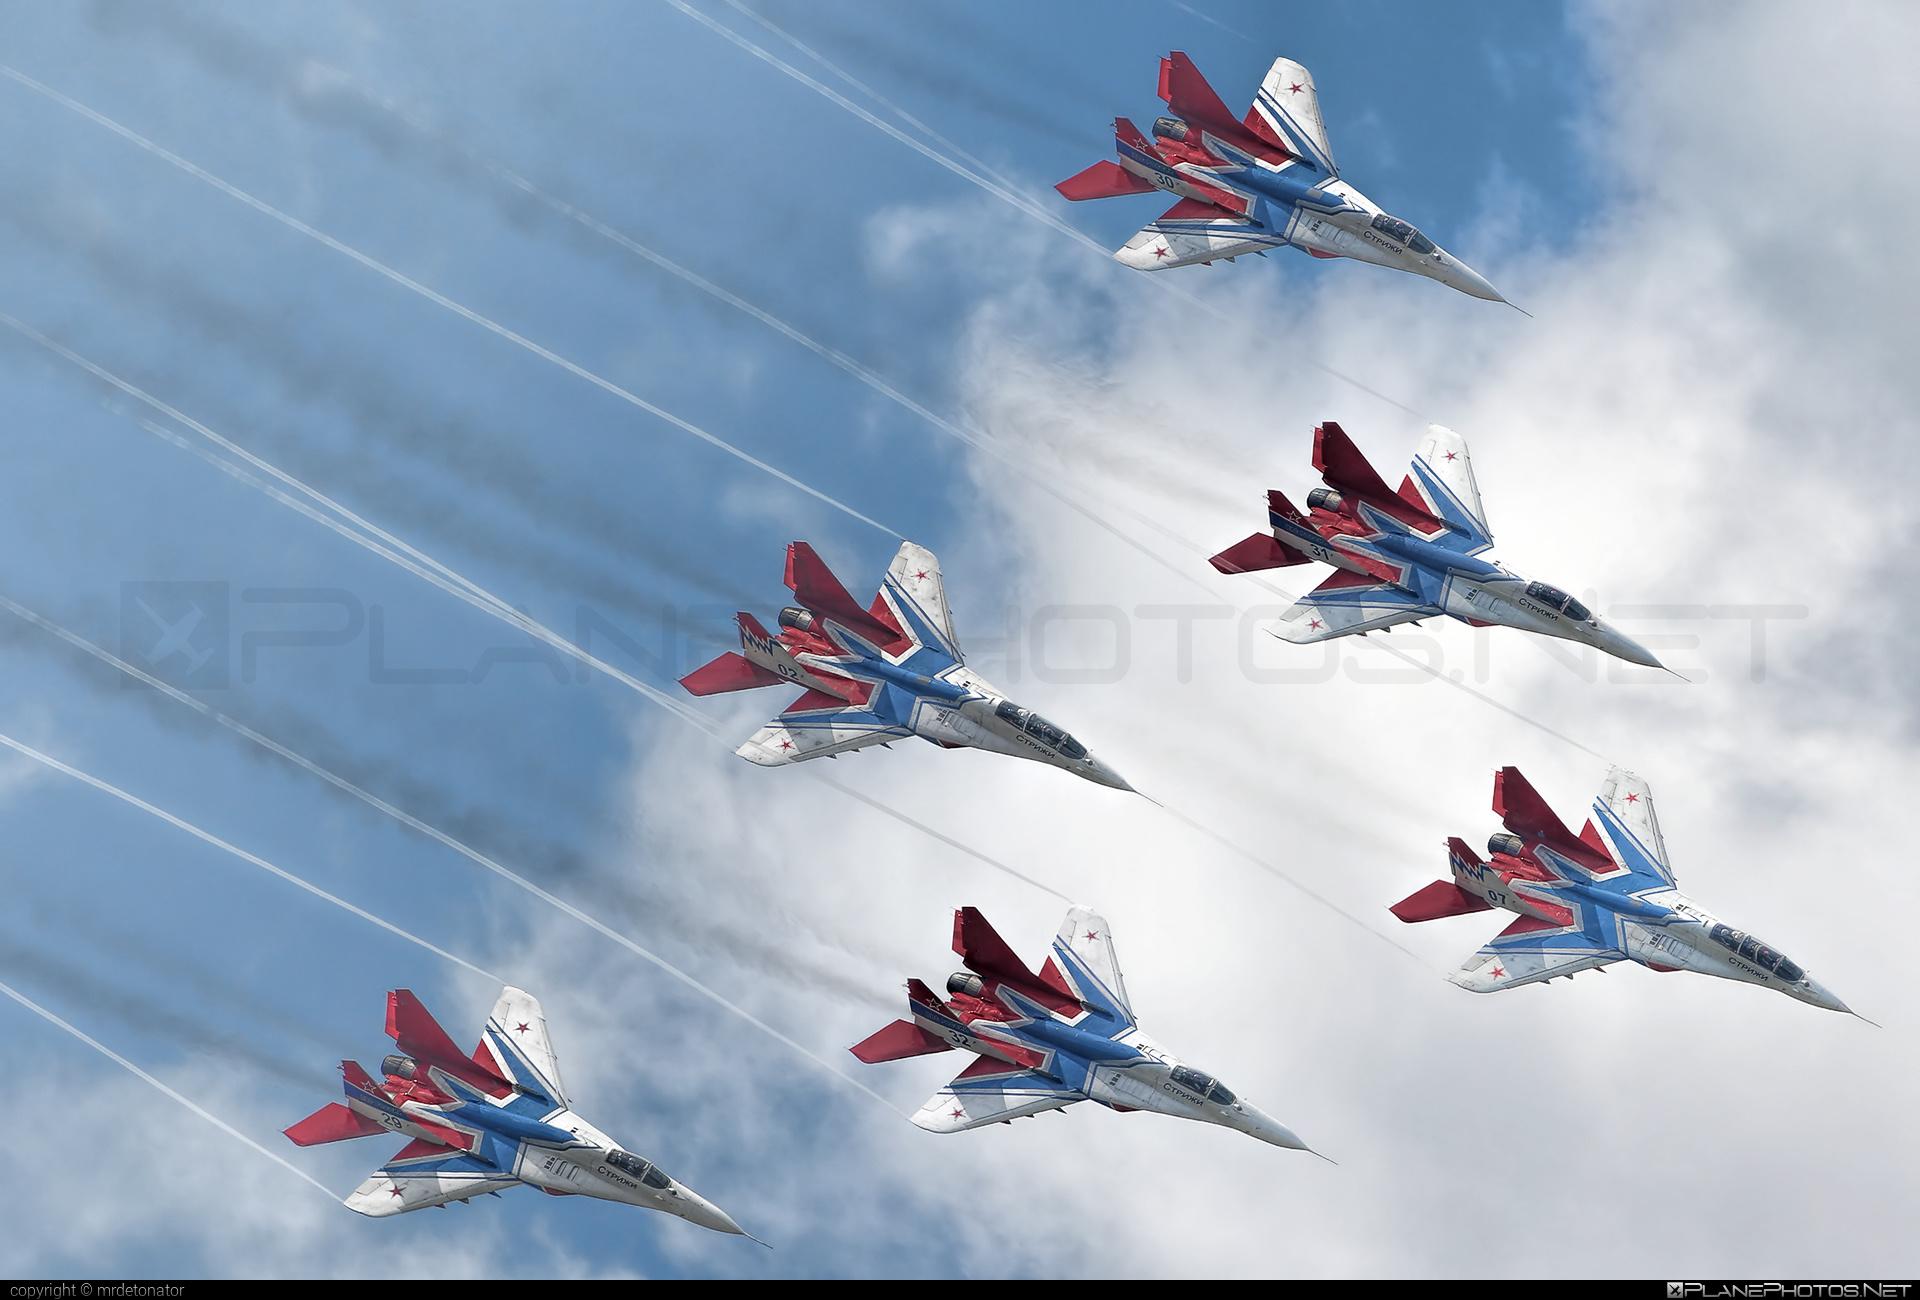 Mikoyan-Gurevich MiG-29UB - 07 operated by Voyenno-vozdushnye sily Rossii (Russian Air Force) #mig #mig29 #mig29ub #mikoyangurevich